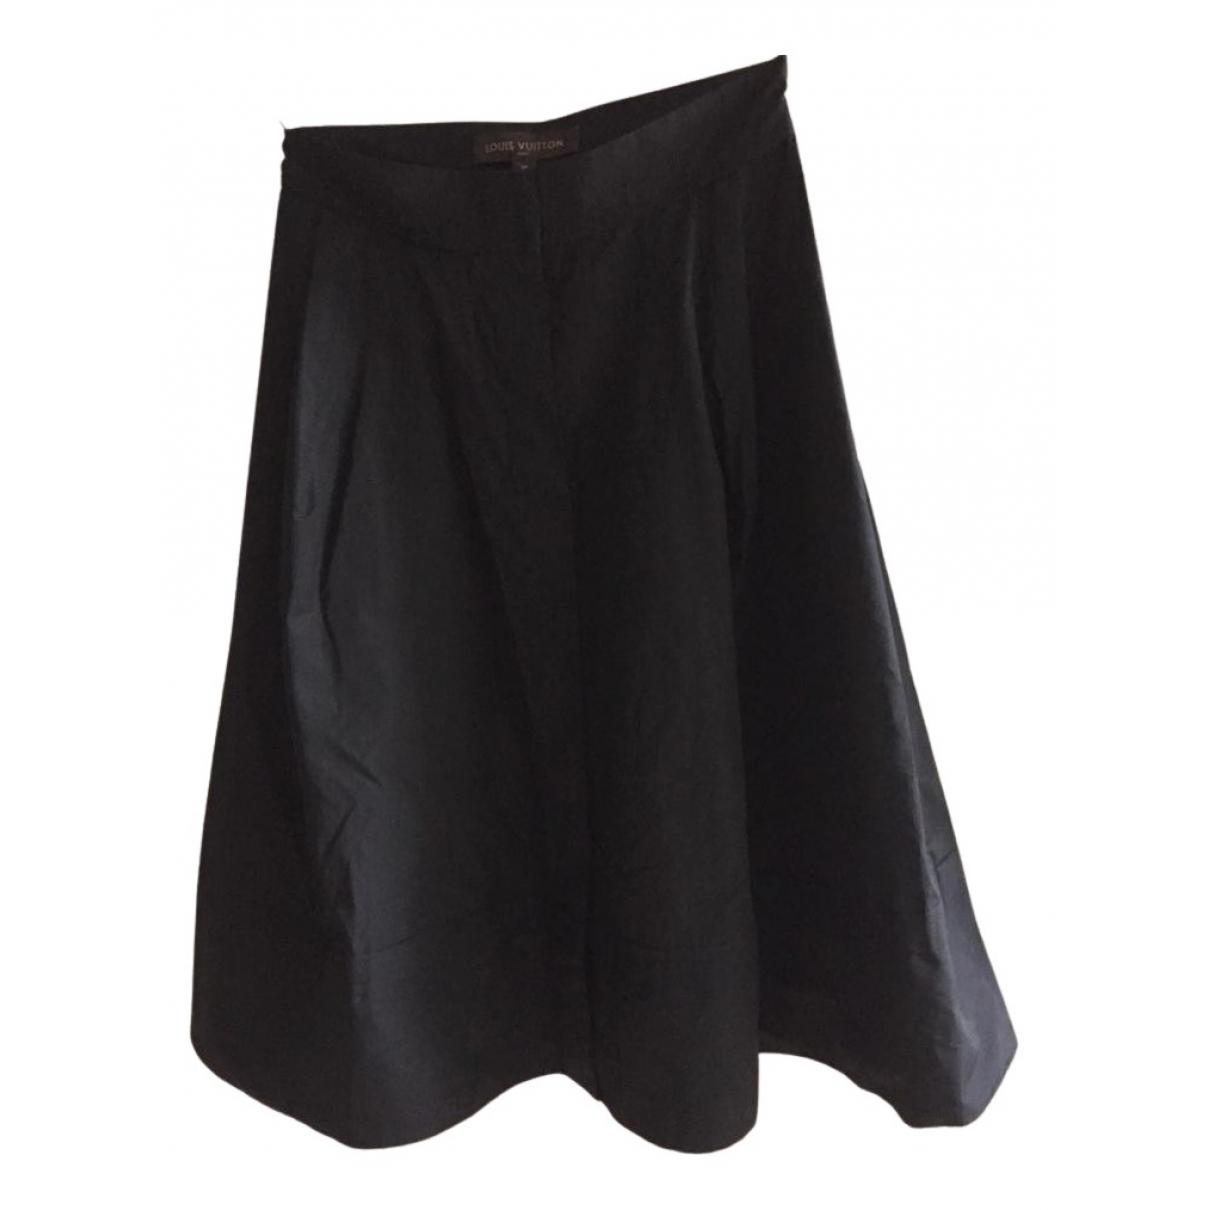 Louis Vuitton N Black Cotton skirt for Women 38 FR